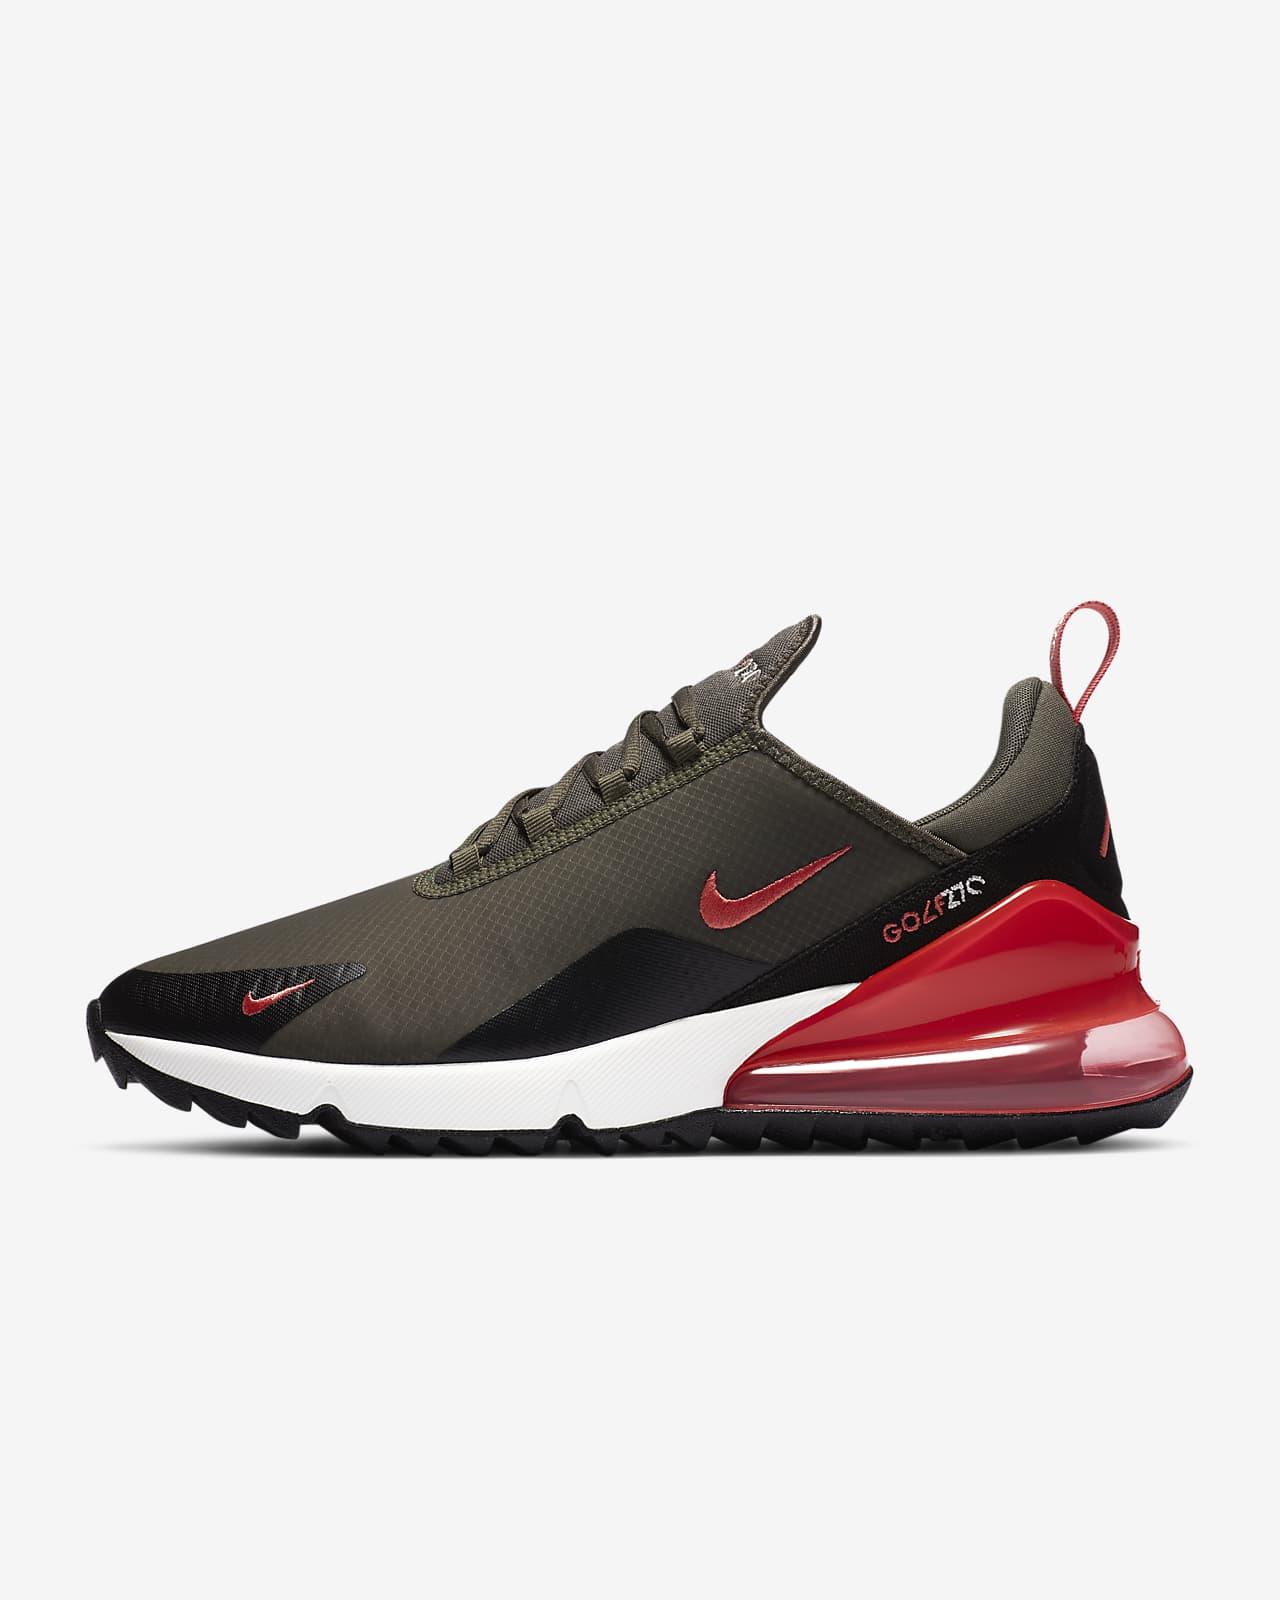 Nike Air Max 270 G Nrg Golf Shoe Nike Lu